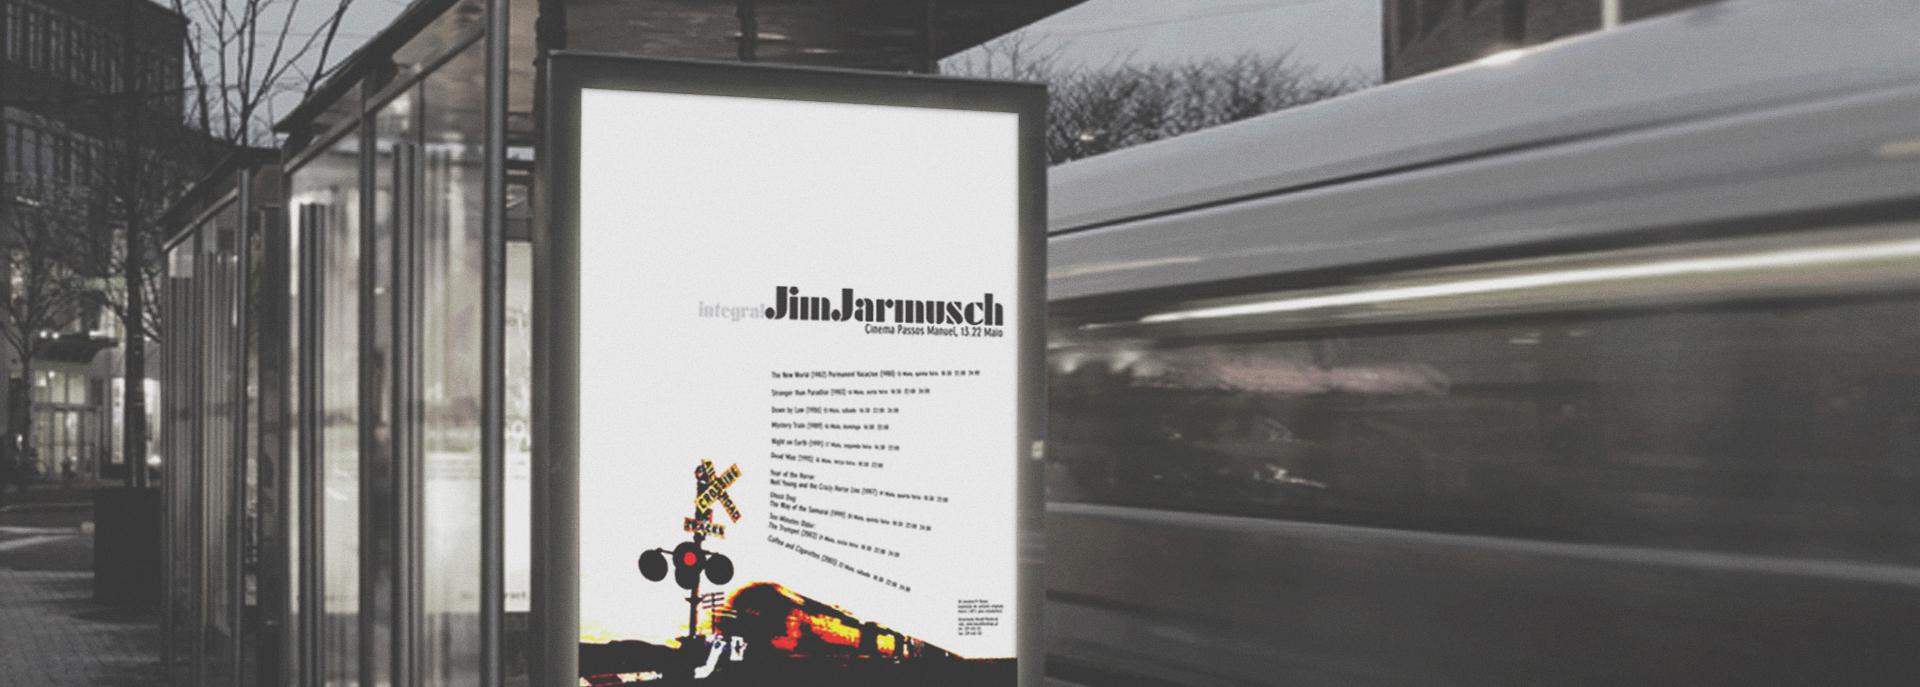 Design-Grafico-Graphic-Design-Cartaz-Poster-Mupi-Festival-Cinema-Film-Festival-Jim-Jarmush-bonjourmolotov_N4.jpg